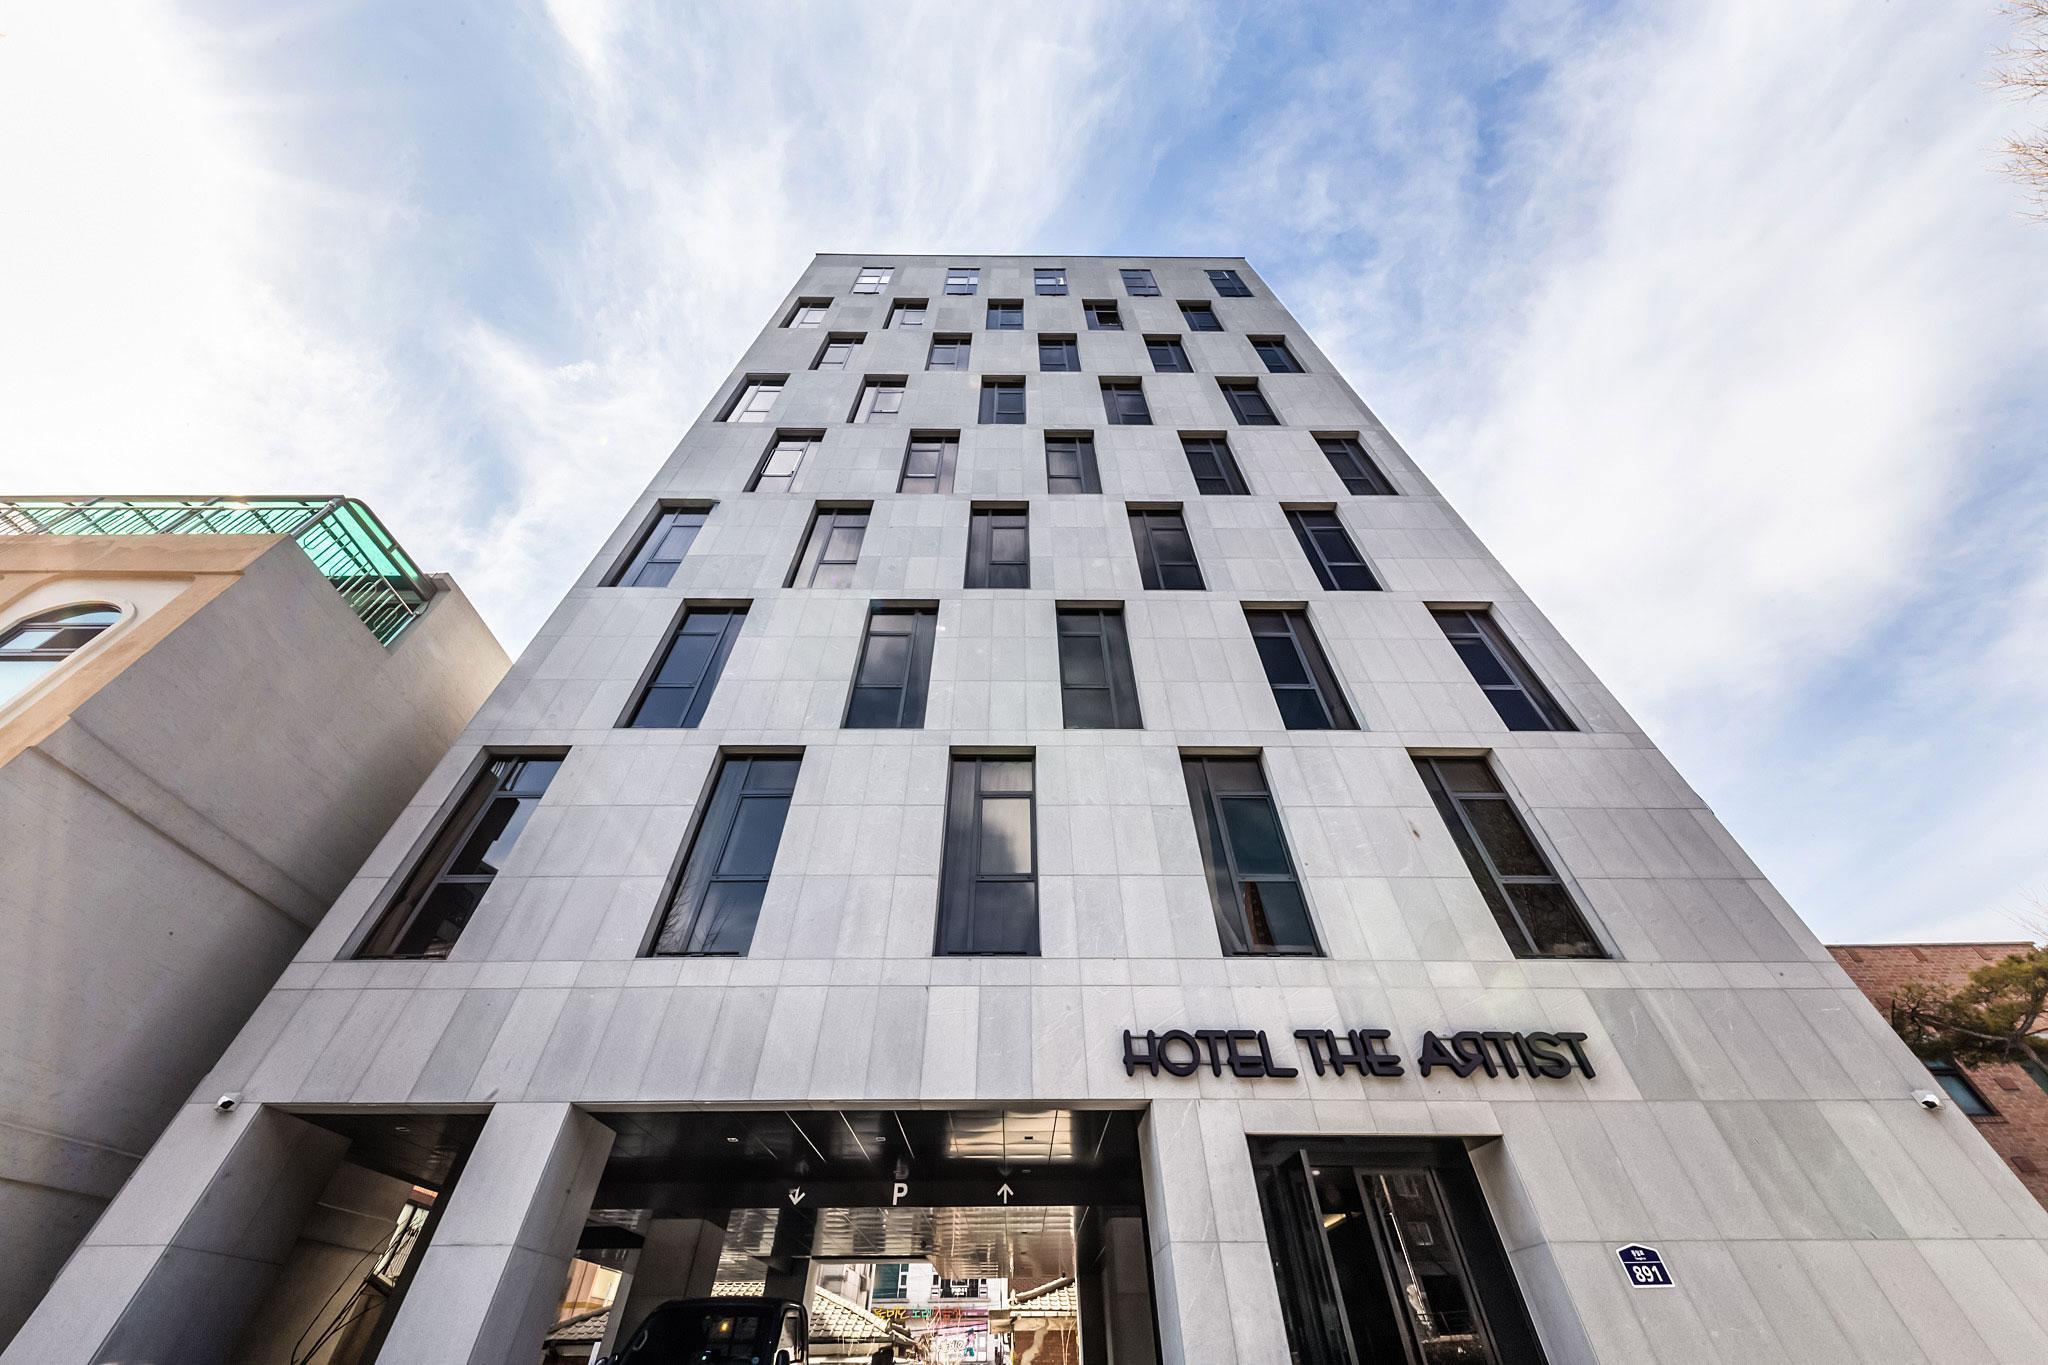 Hotel The Artist Yeonsinnae, Eun-pyeong